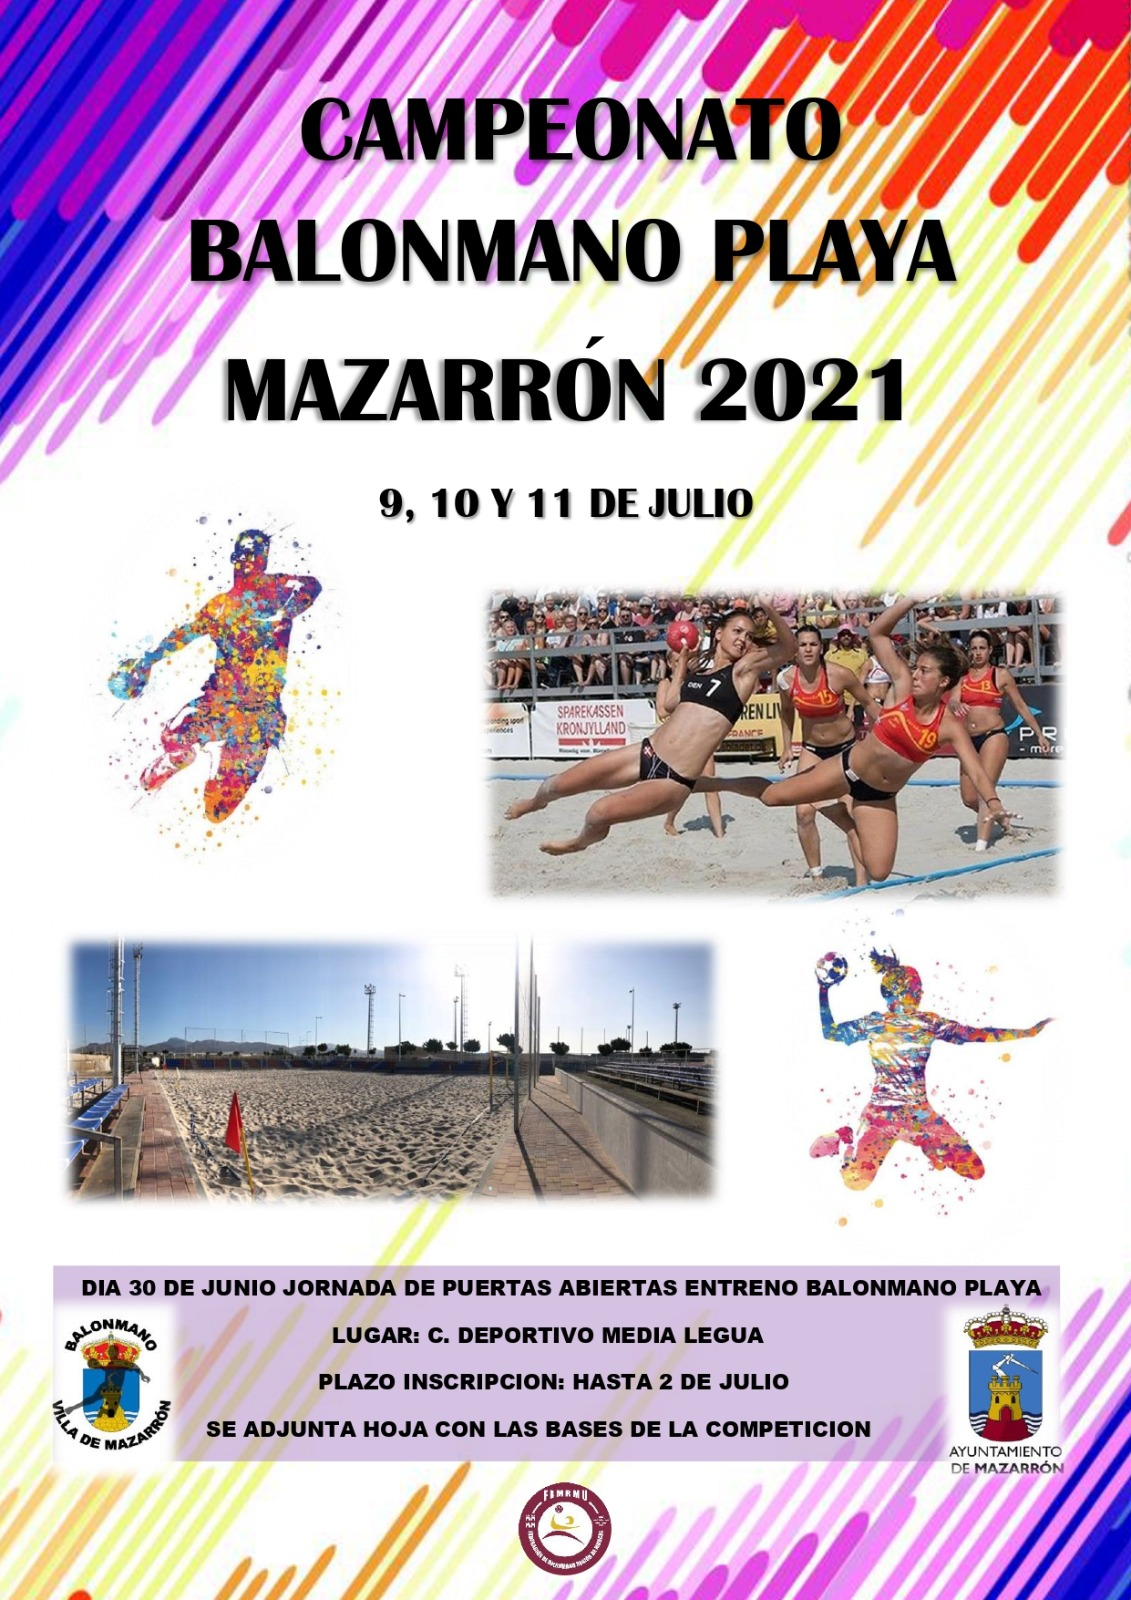 Third Beach Handball championship on July 9, 10 and 11